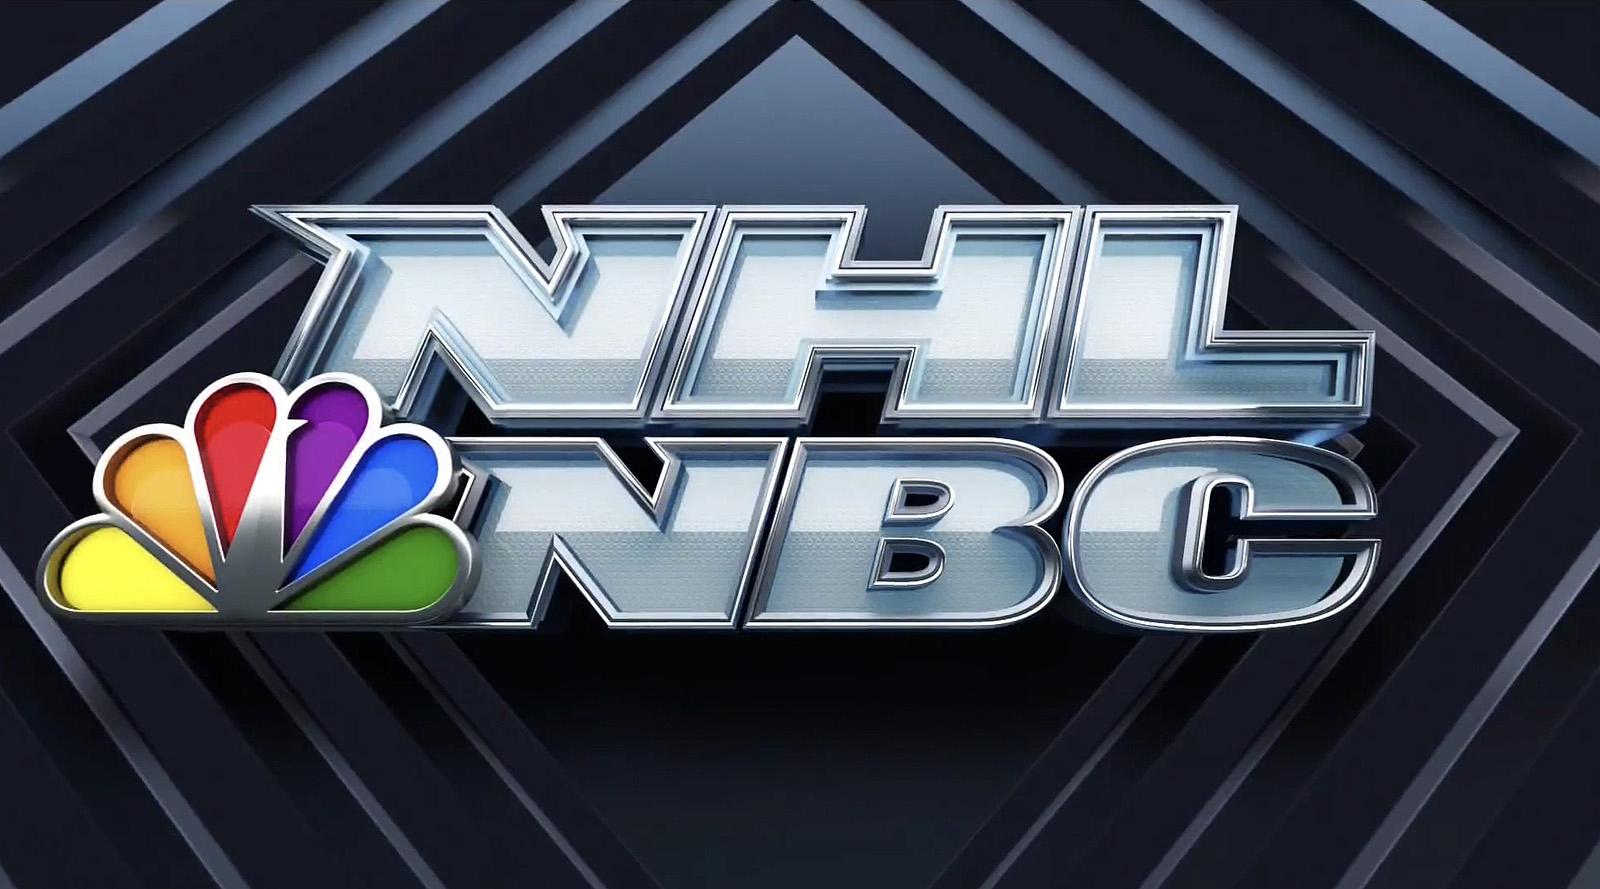 Tamirmoore: 2019 - 2020 Nhl On Nbcsn Schedule with Complete Nashville Predators 2019-2020 Schedule